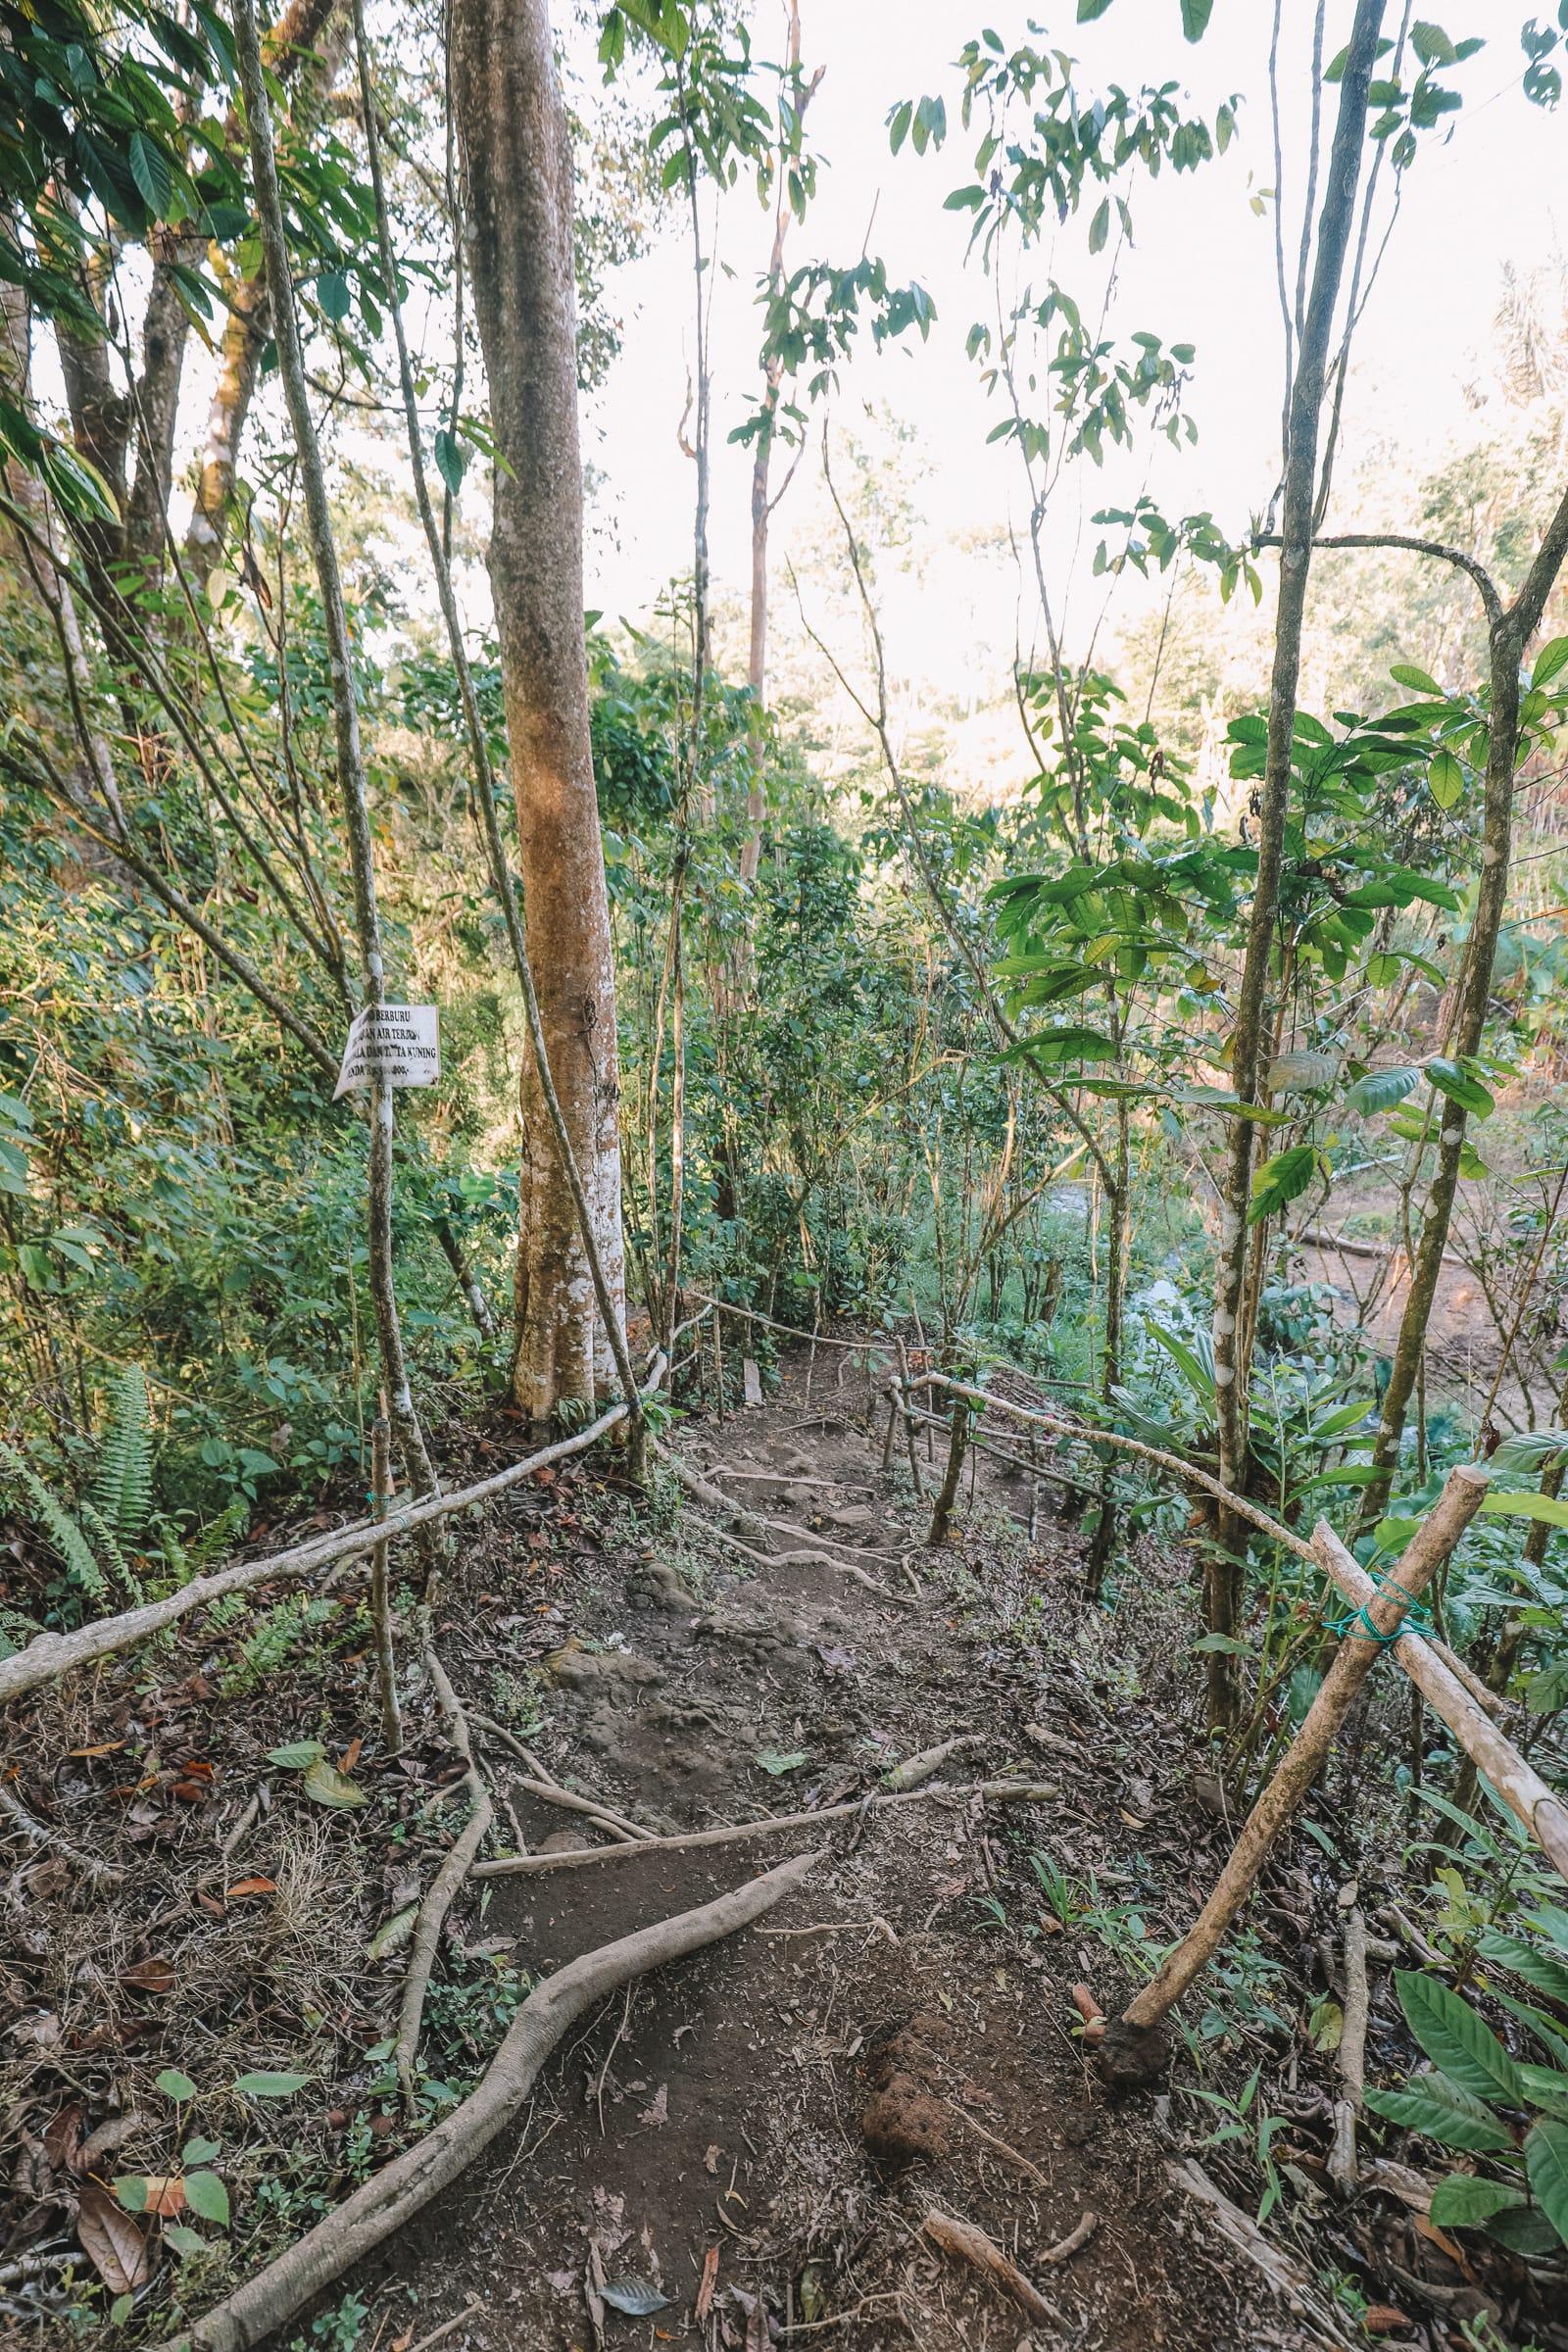 The Amazing Banyumala Twin Waterfalls In The Jungles Of Bali (7)